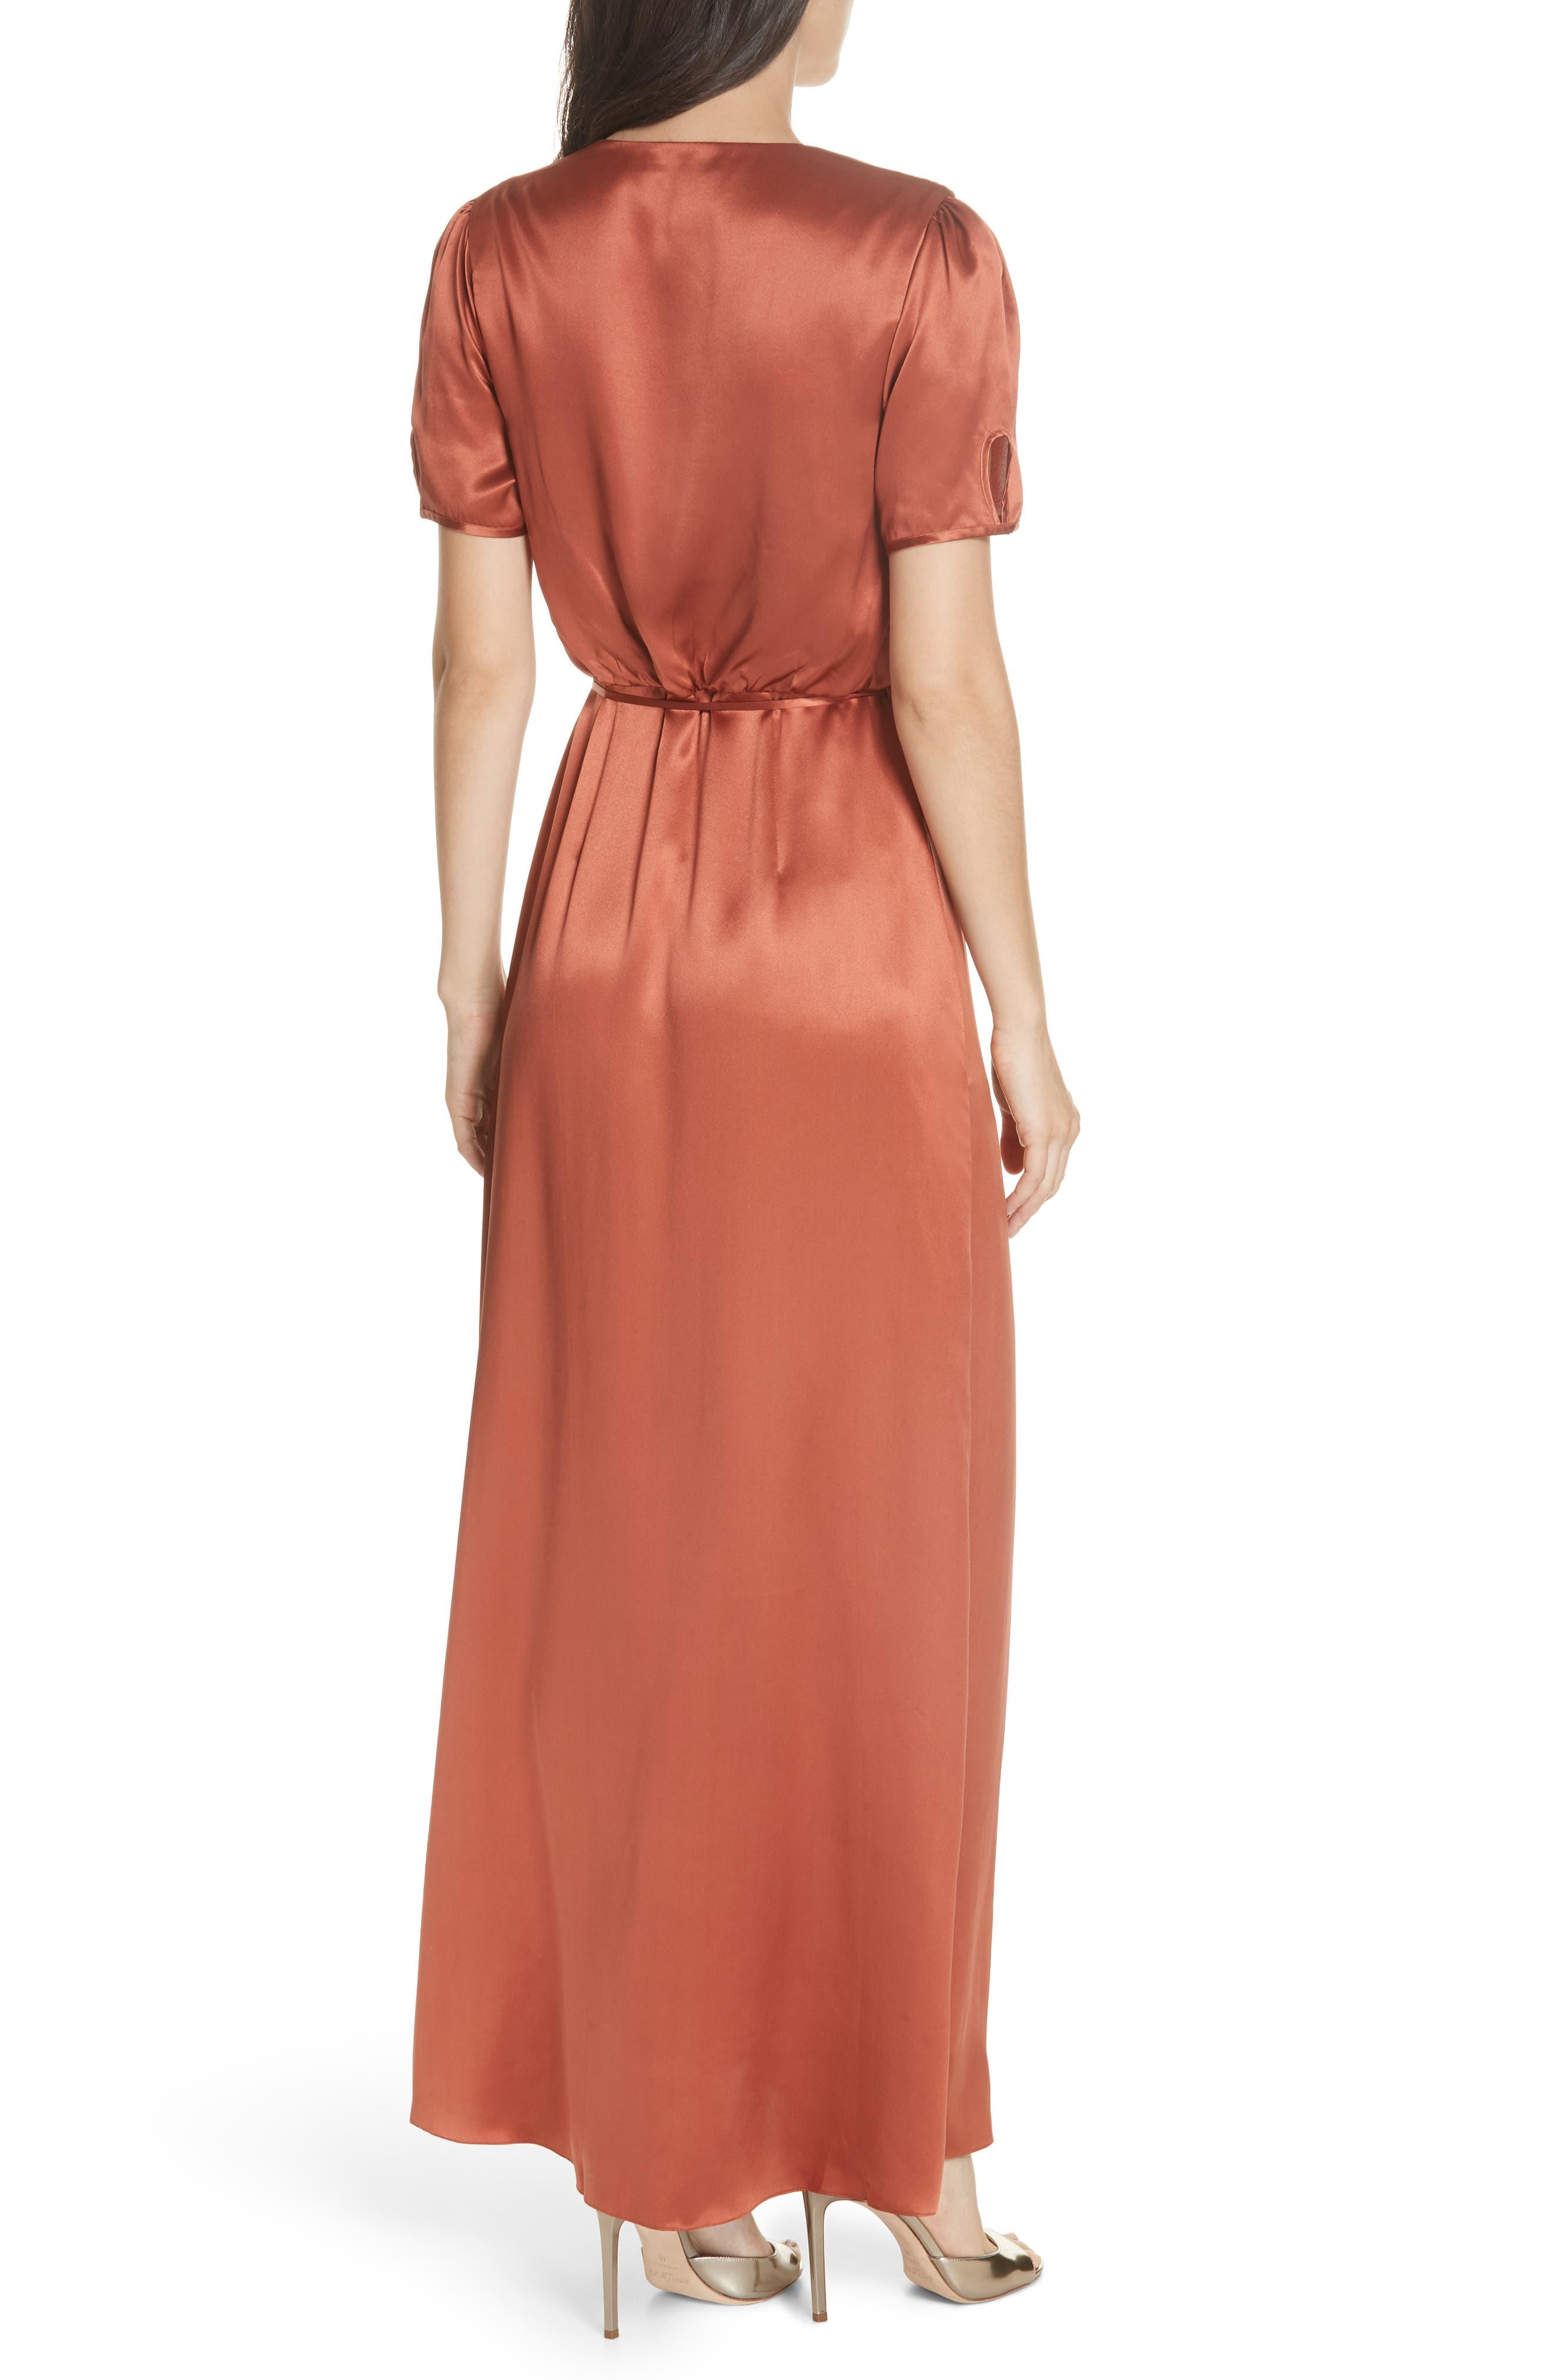 SALONI, Lea Silk Wrap Dress, Alternate thumbnail 2, color, DEEP RUSH